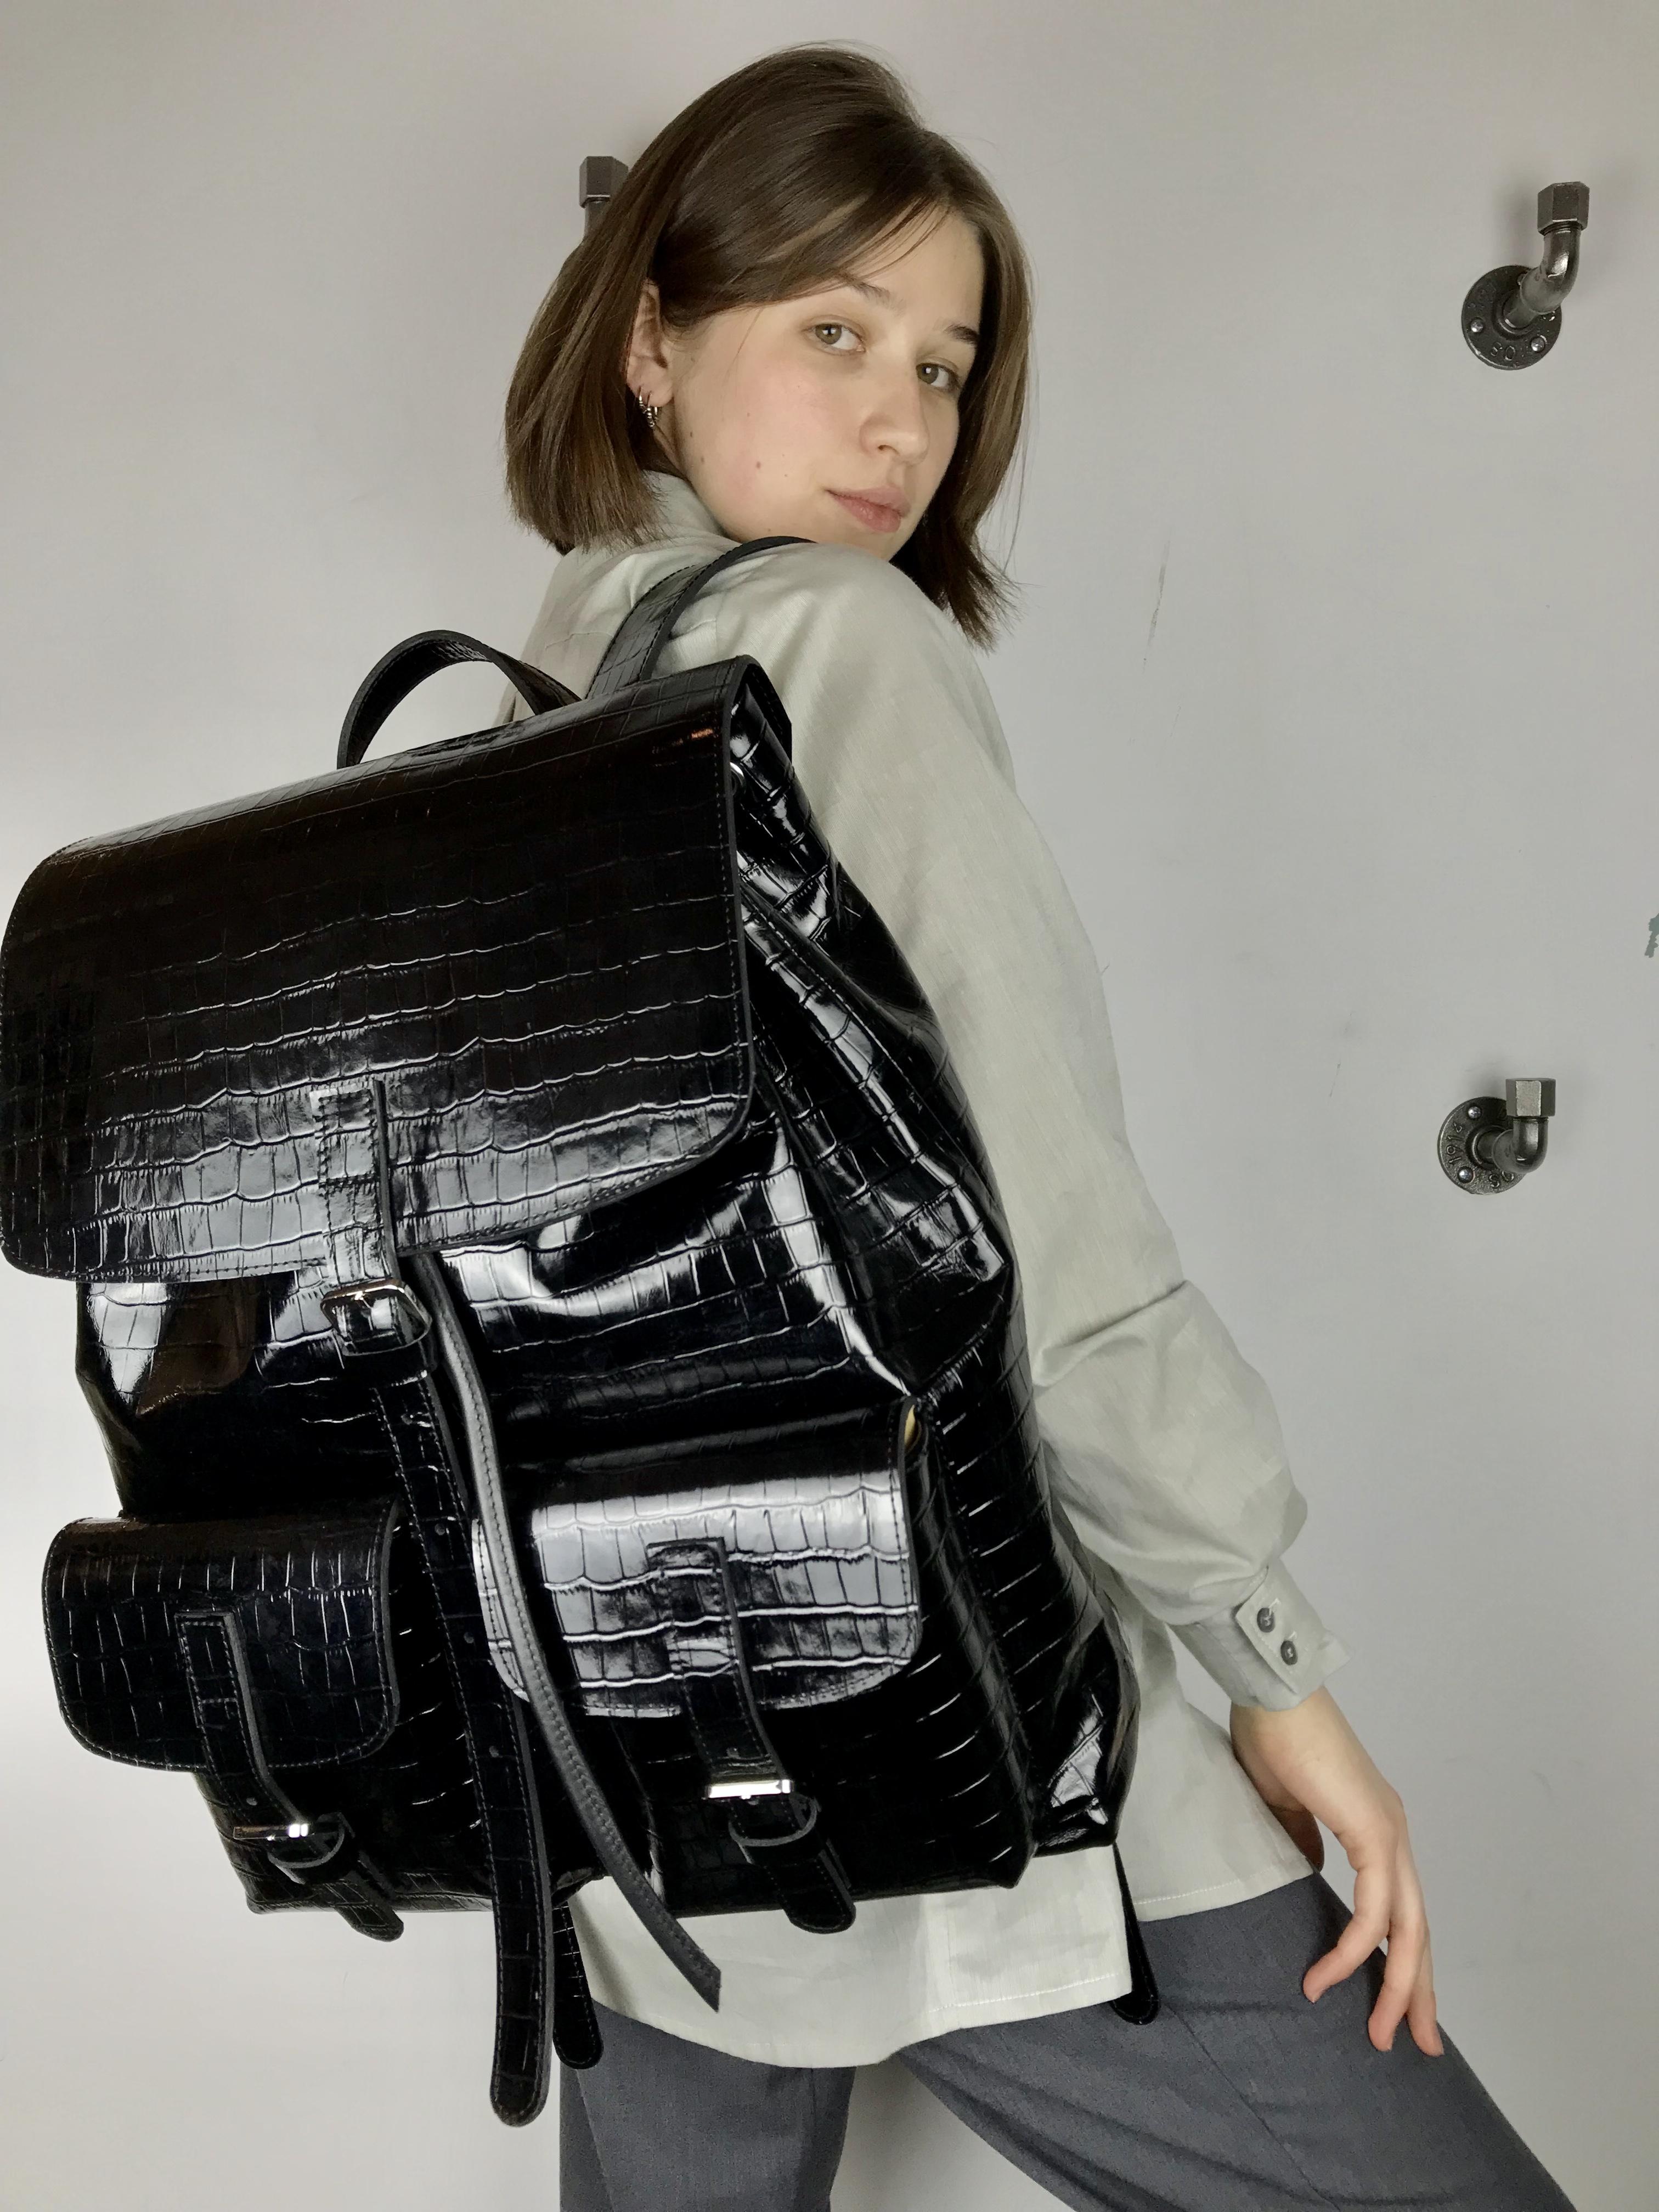 Thumbnail: Объемный рюкзак из кожи под крокодила